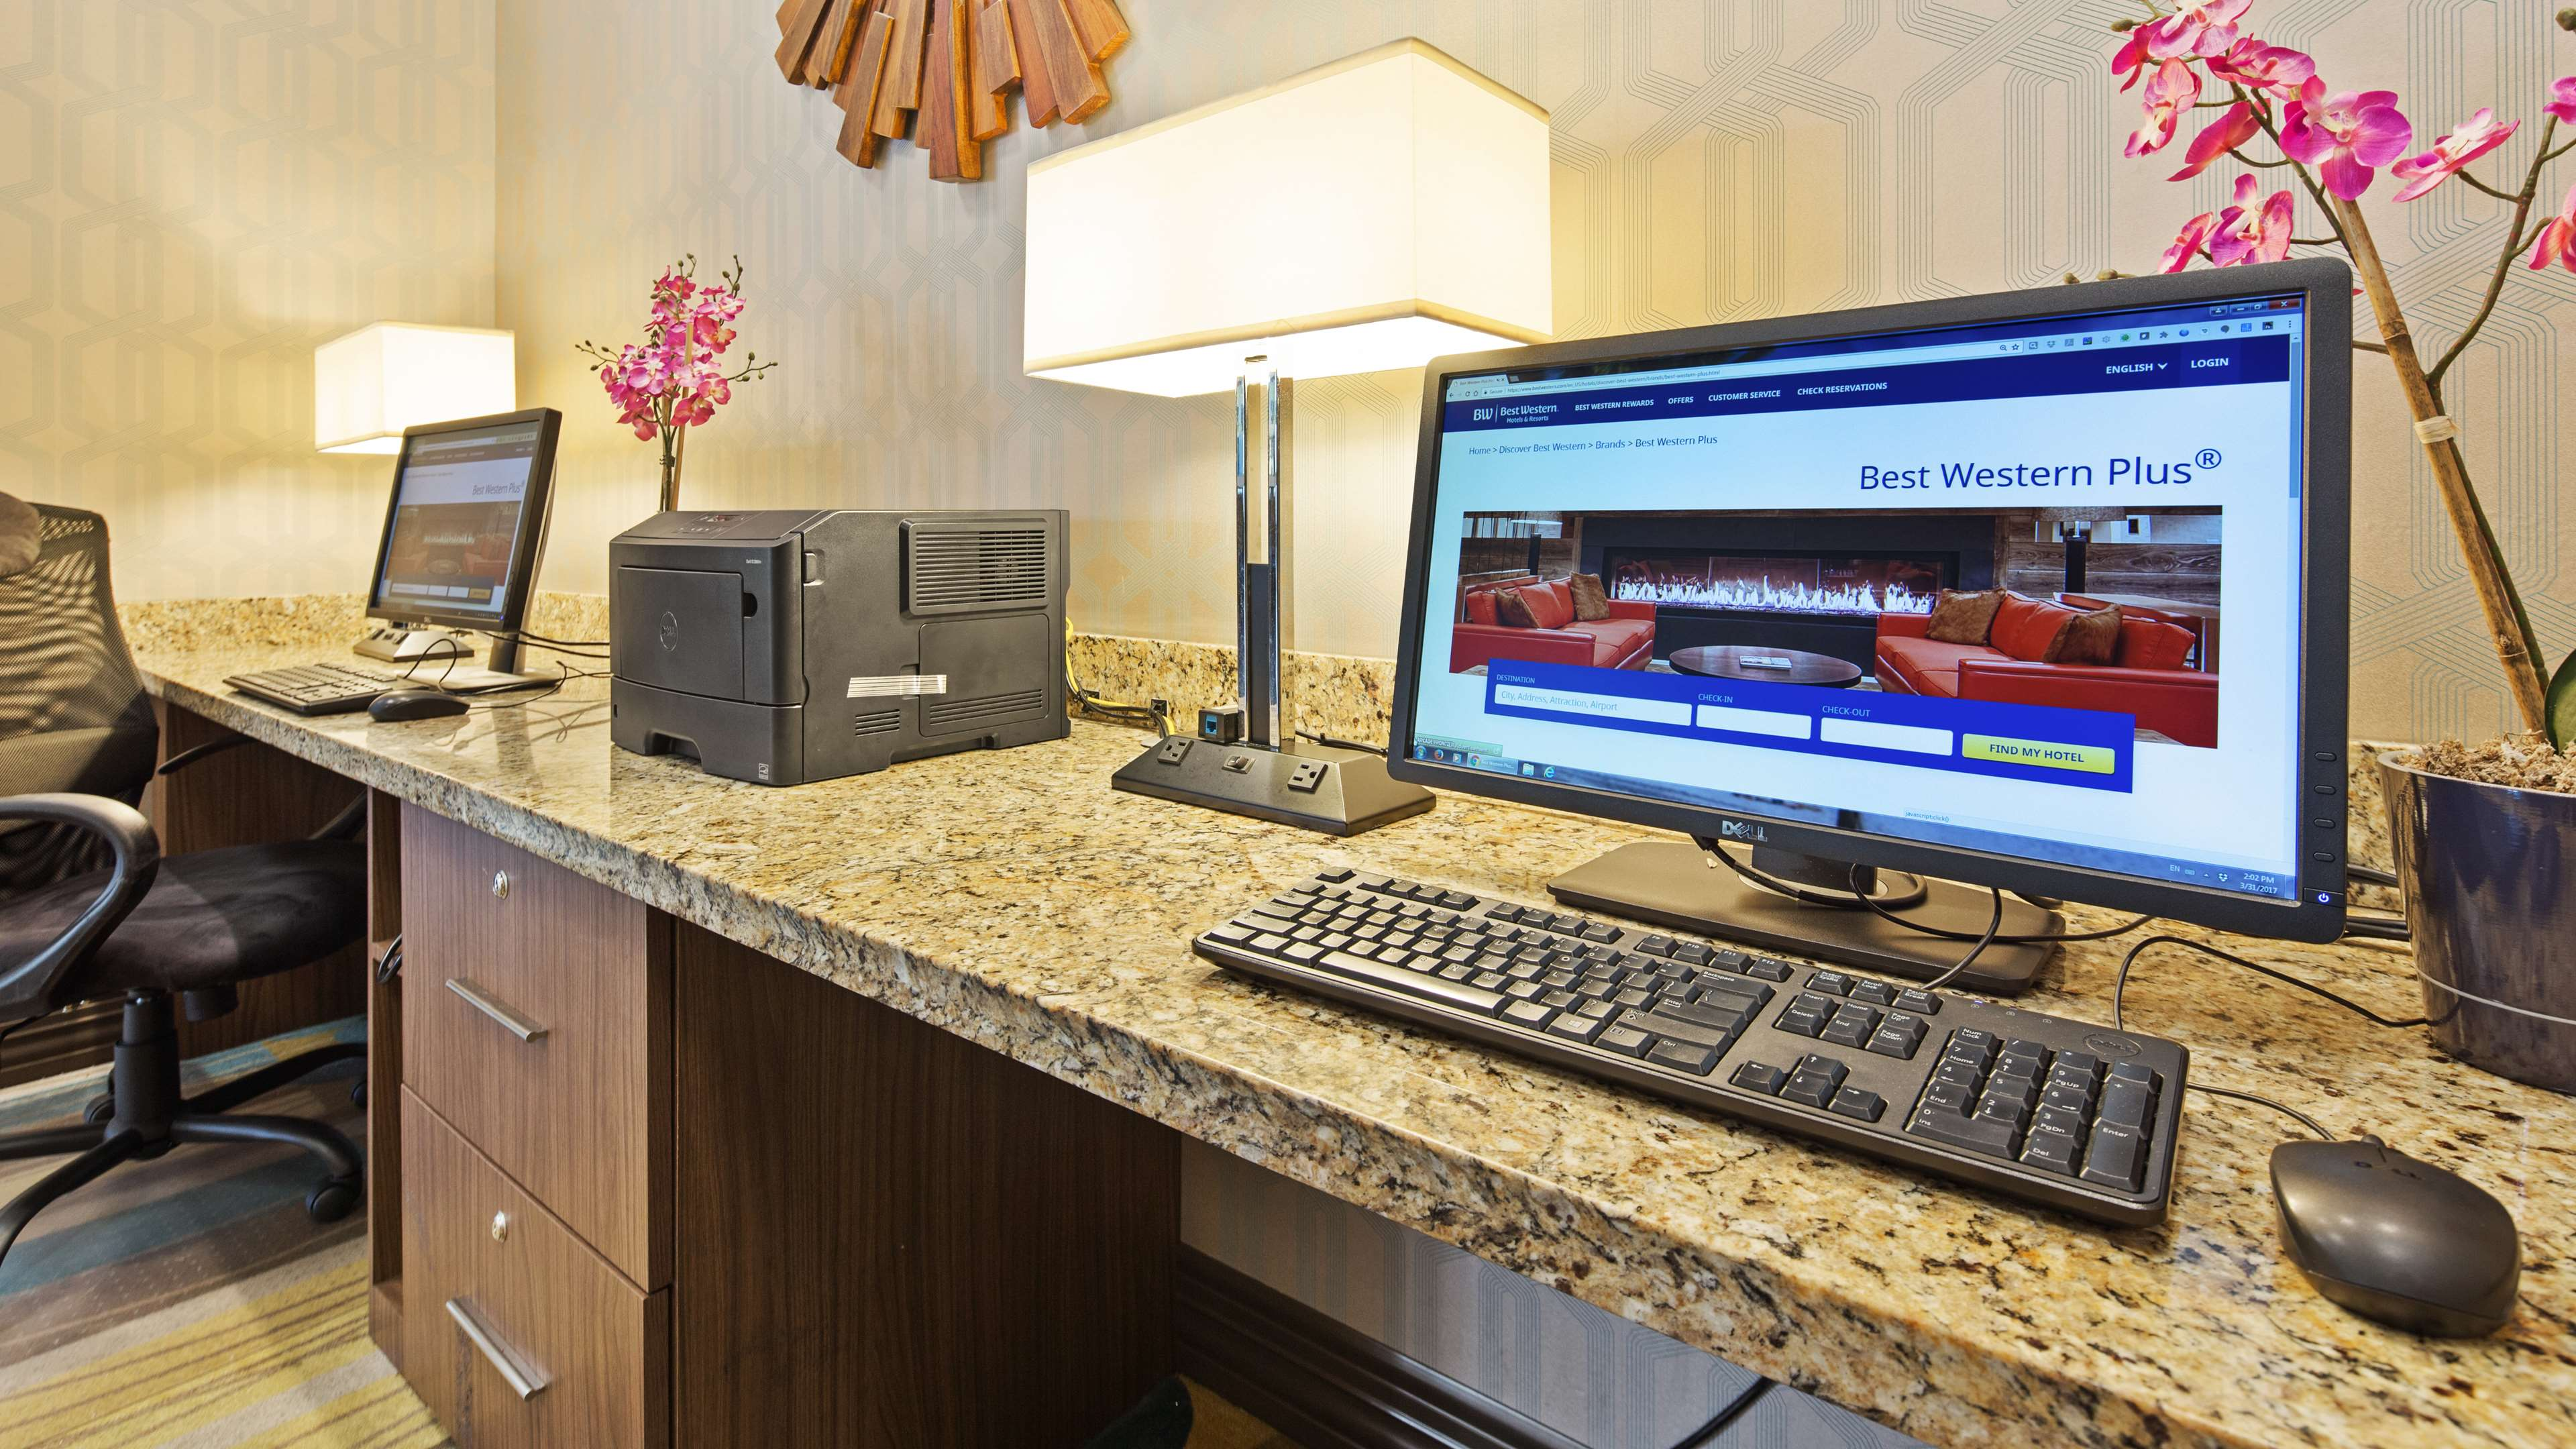 Best Western Plus Kendall Airport Hotel & Suites image 9